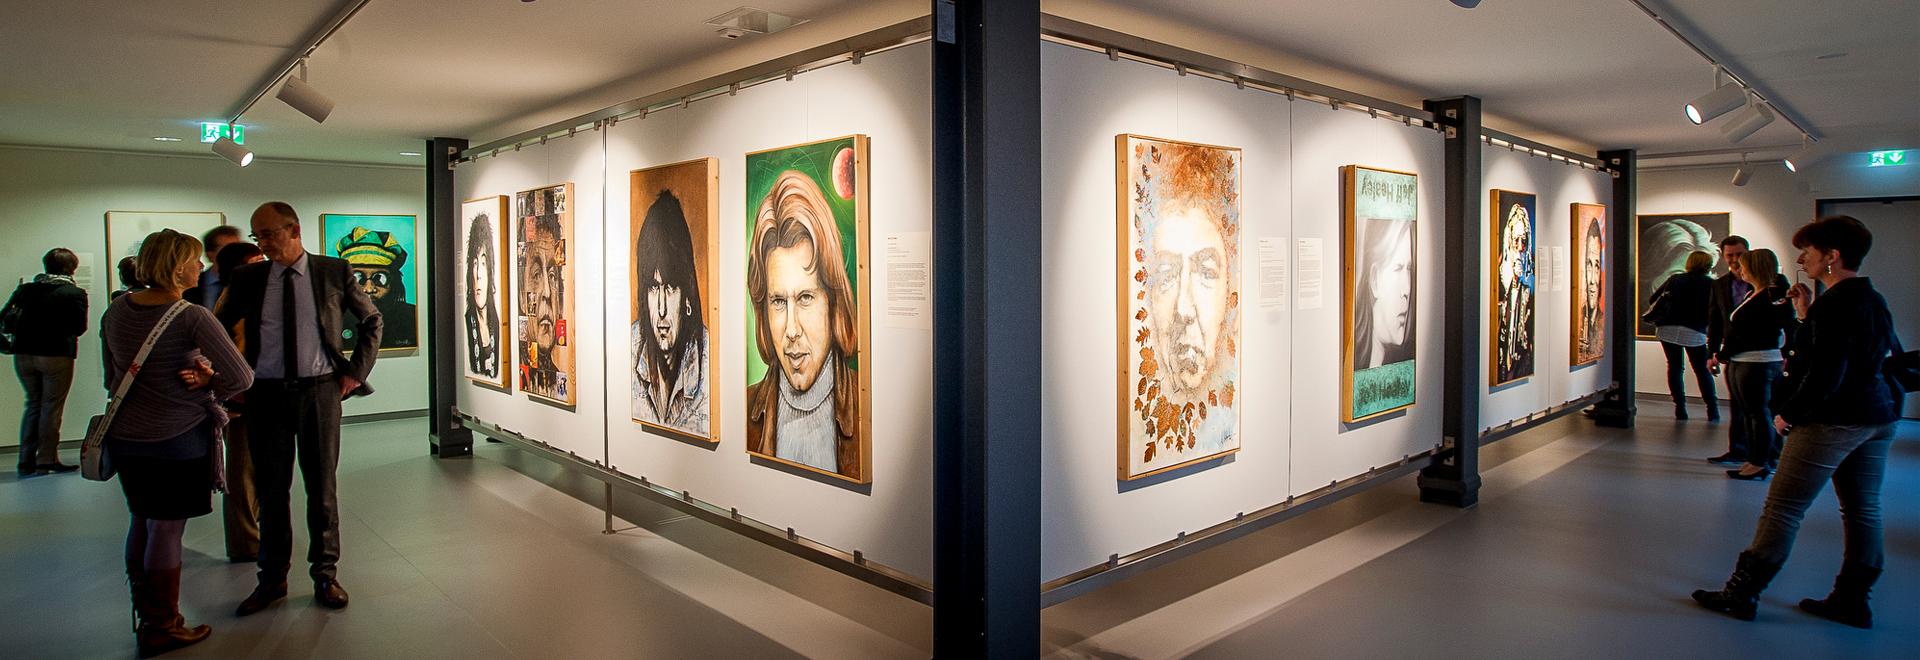 KunstForum Gotha ©J. Schröter